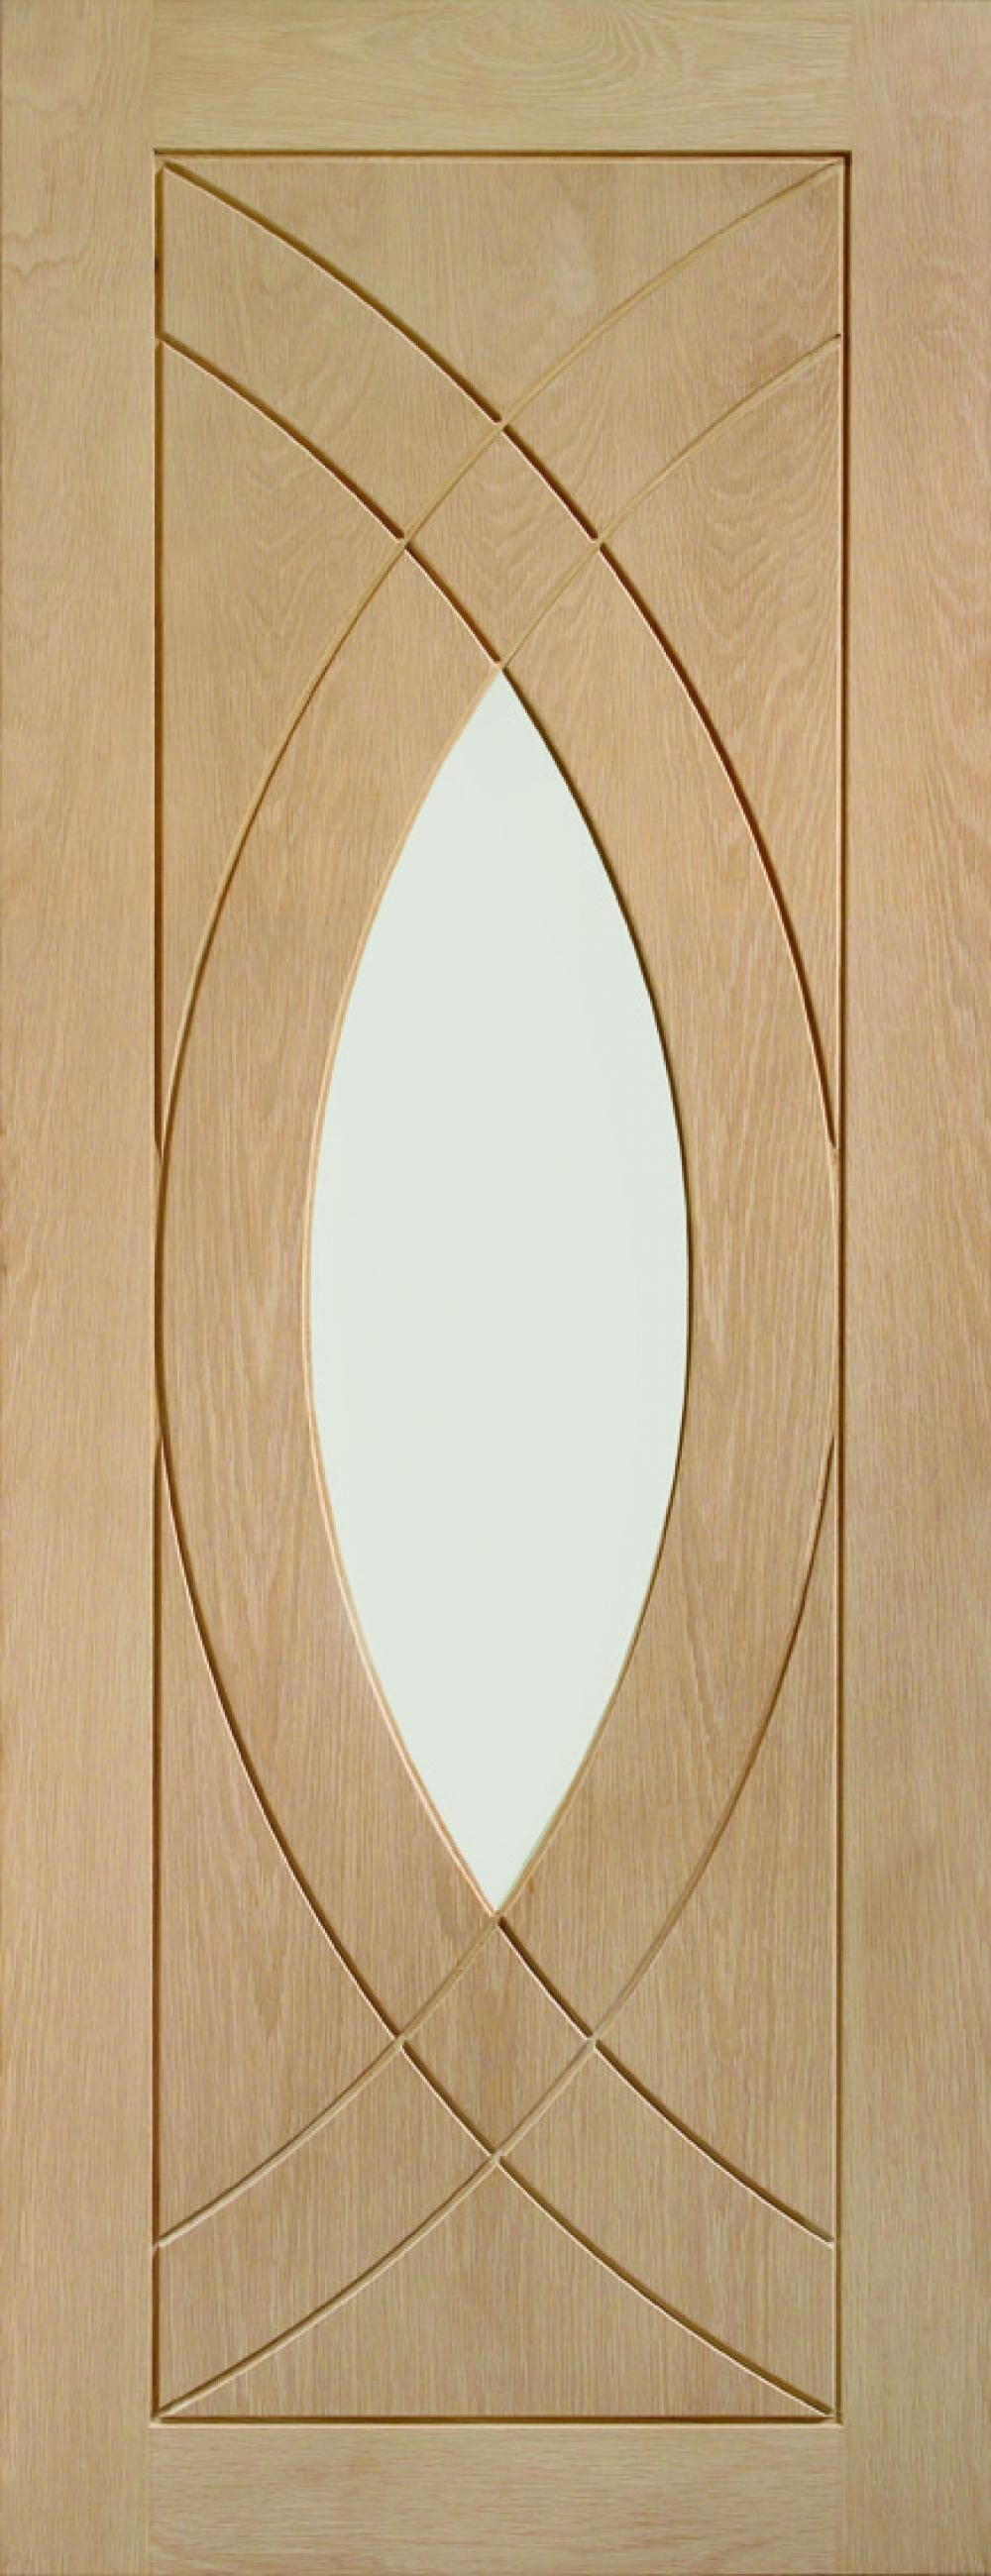 Treviso Oak - Clear Glass Image